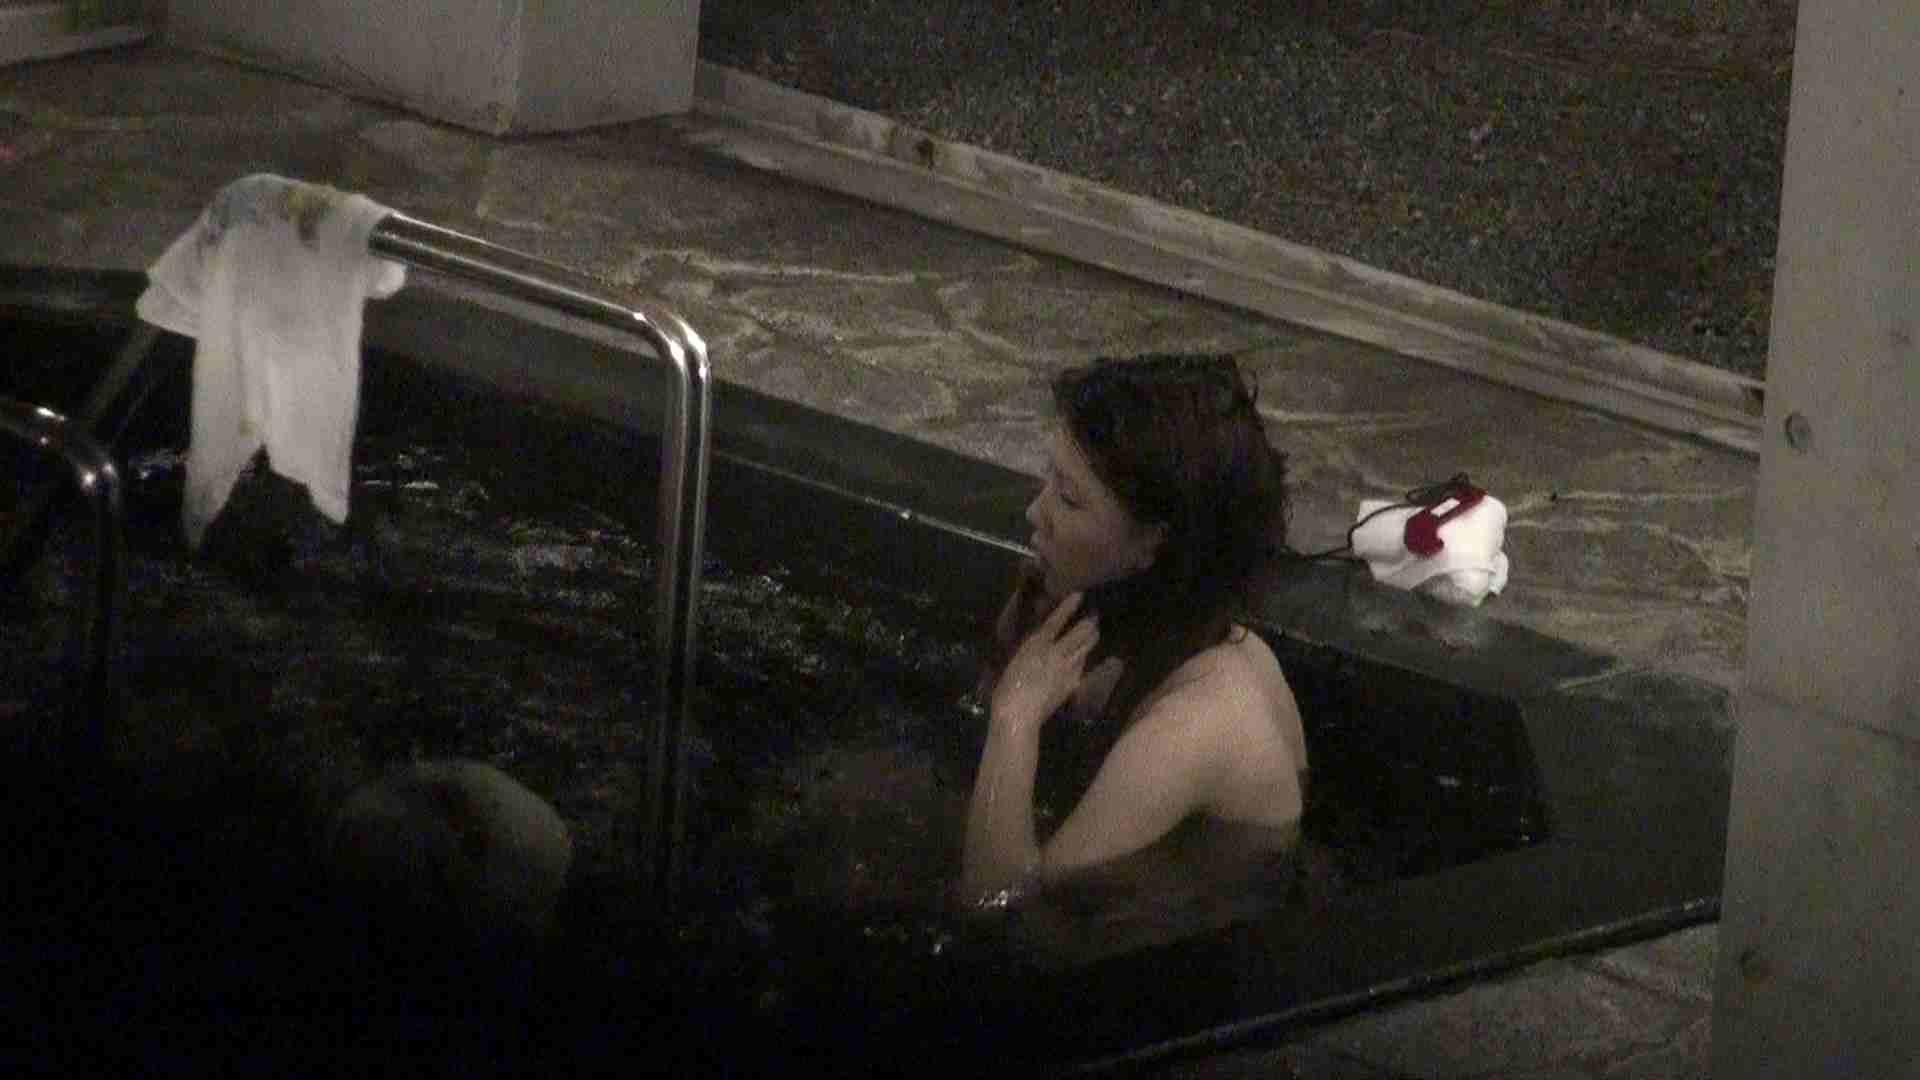 Aquaな露天風呂Vol.371 盗撮大放出 性交動画流出 92連発 63